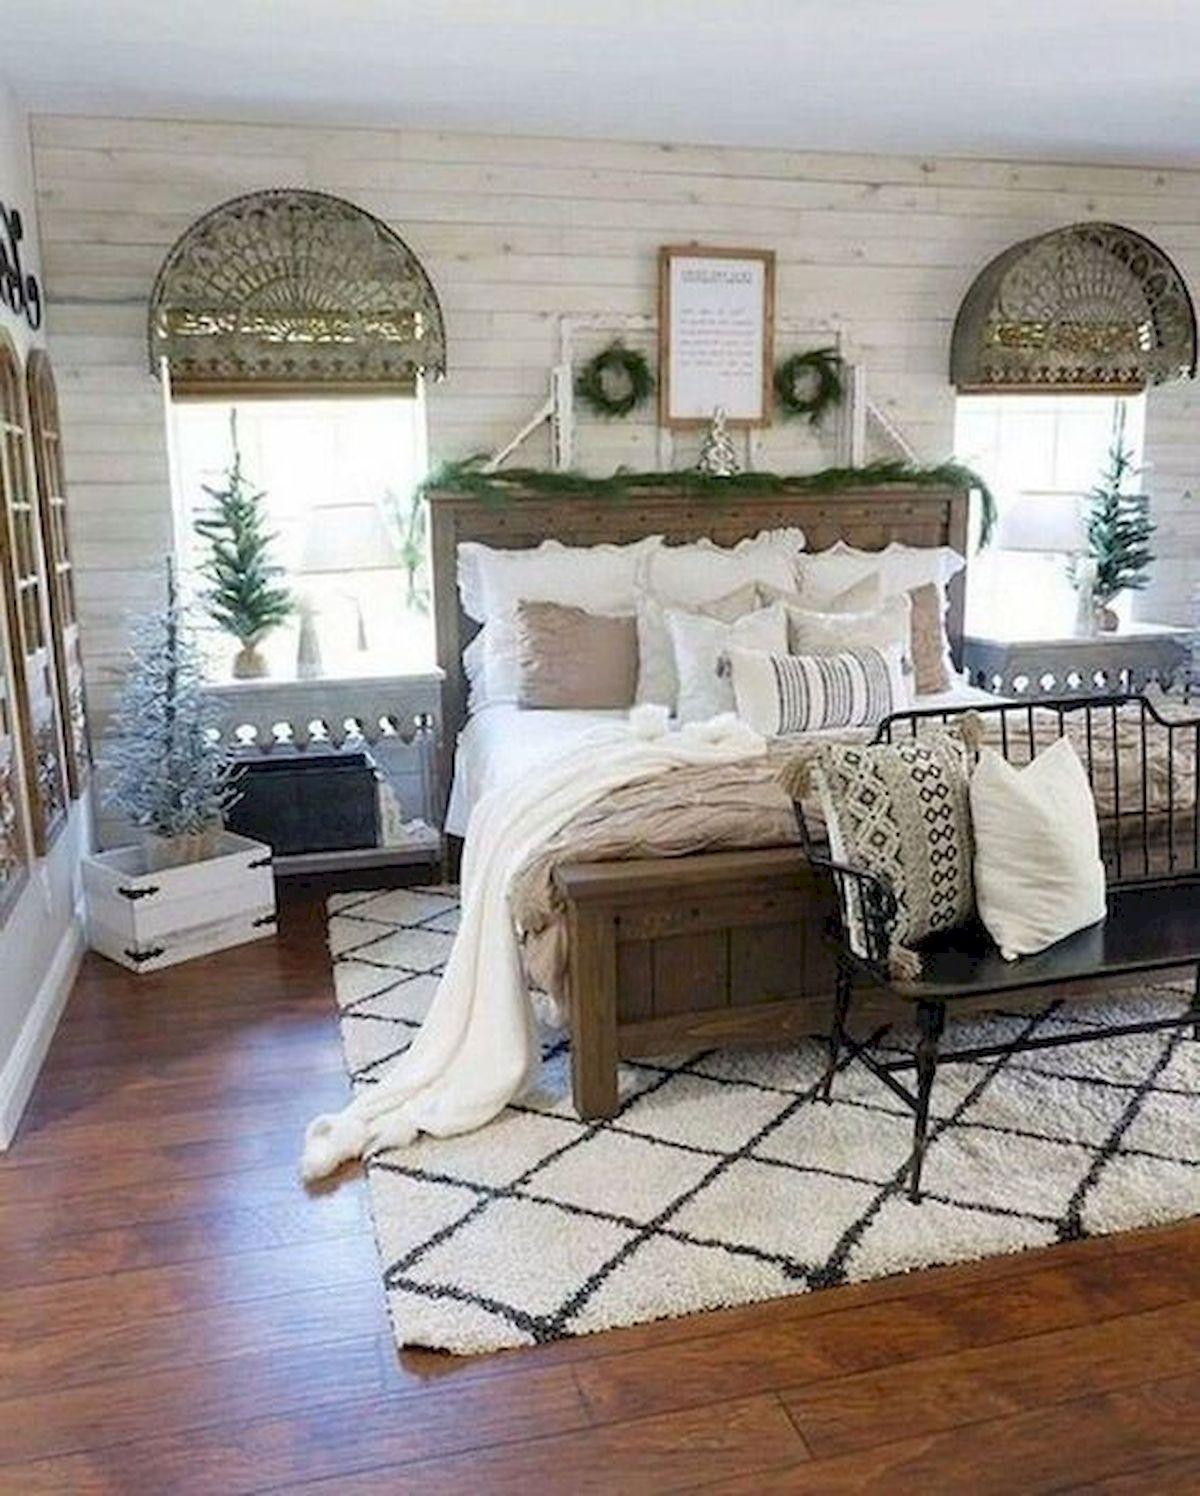 40 Fantastic DIY Decor Ideas For Farmhouse Boho Bedroom Design (39)